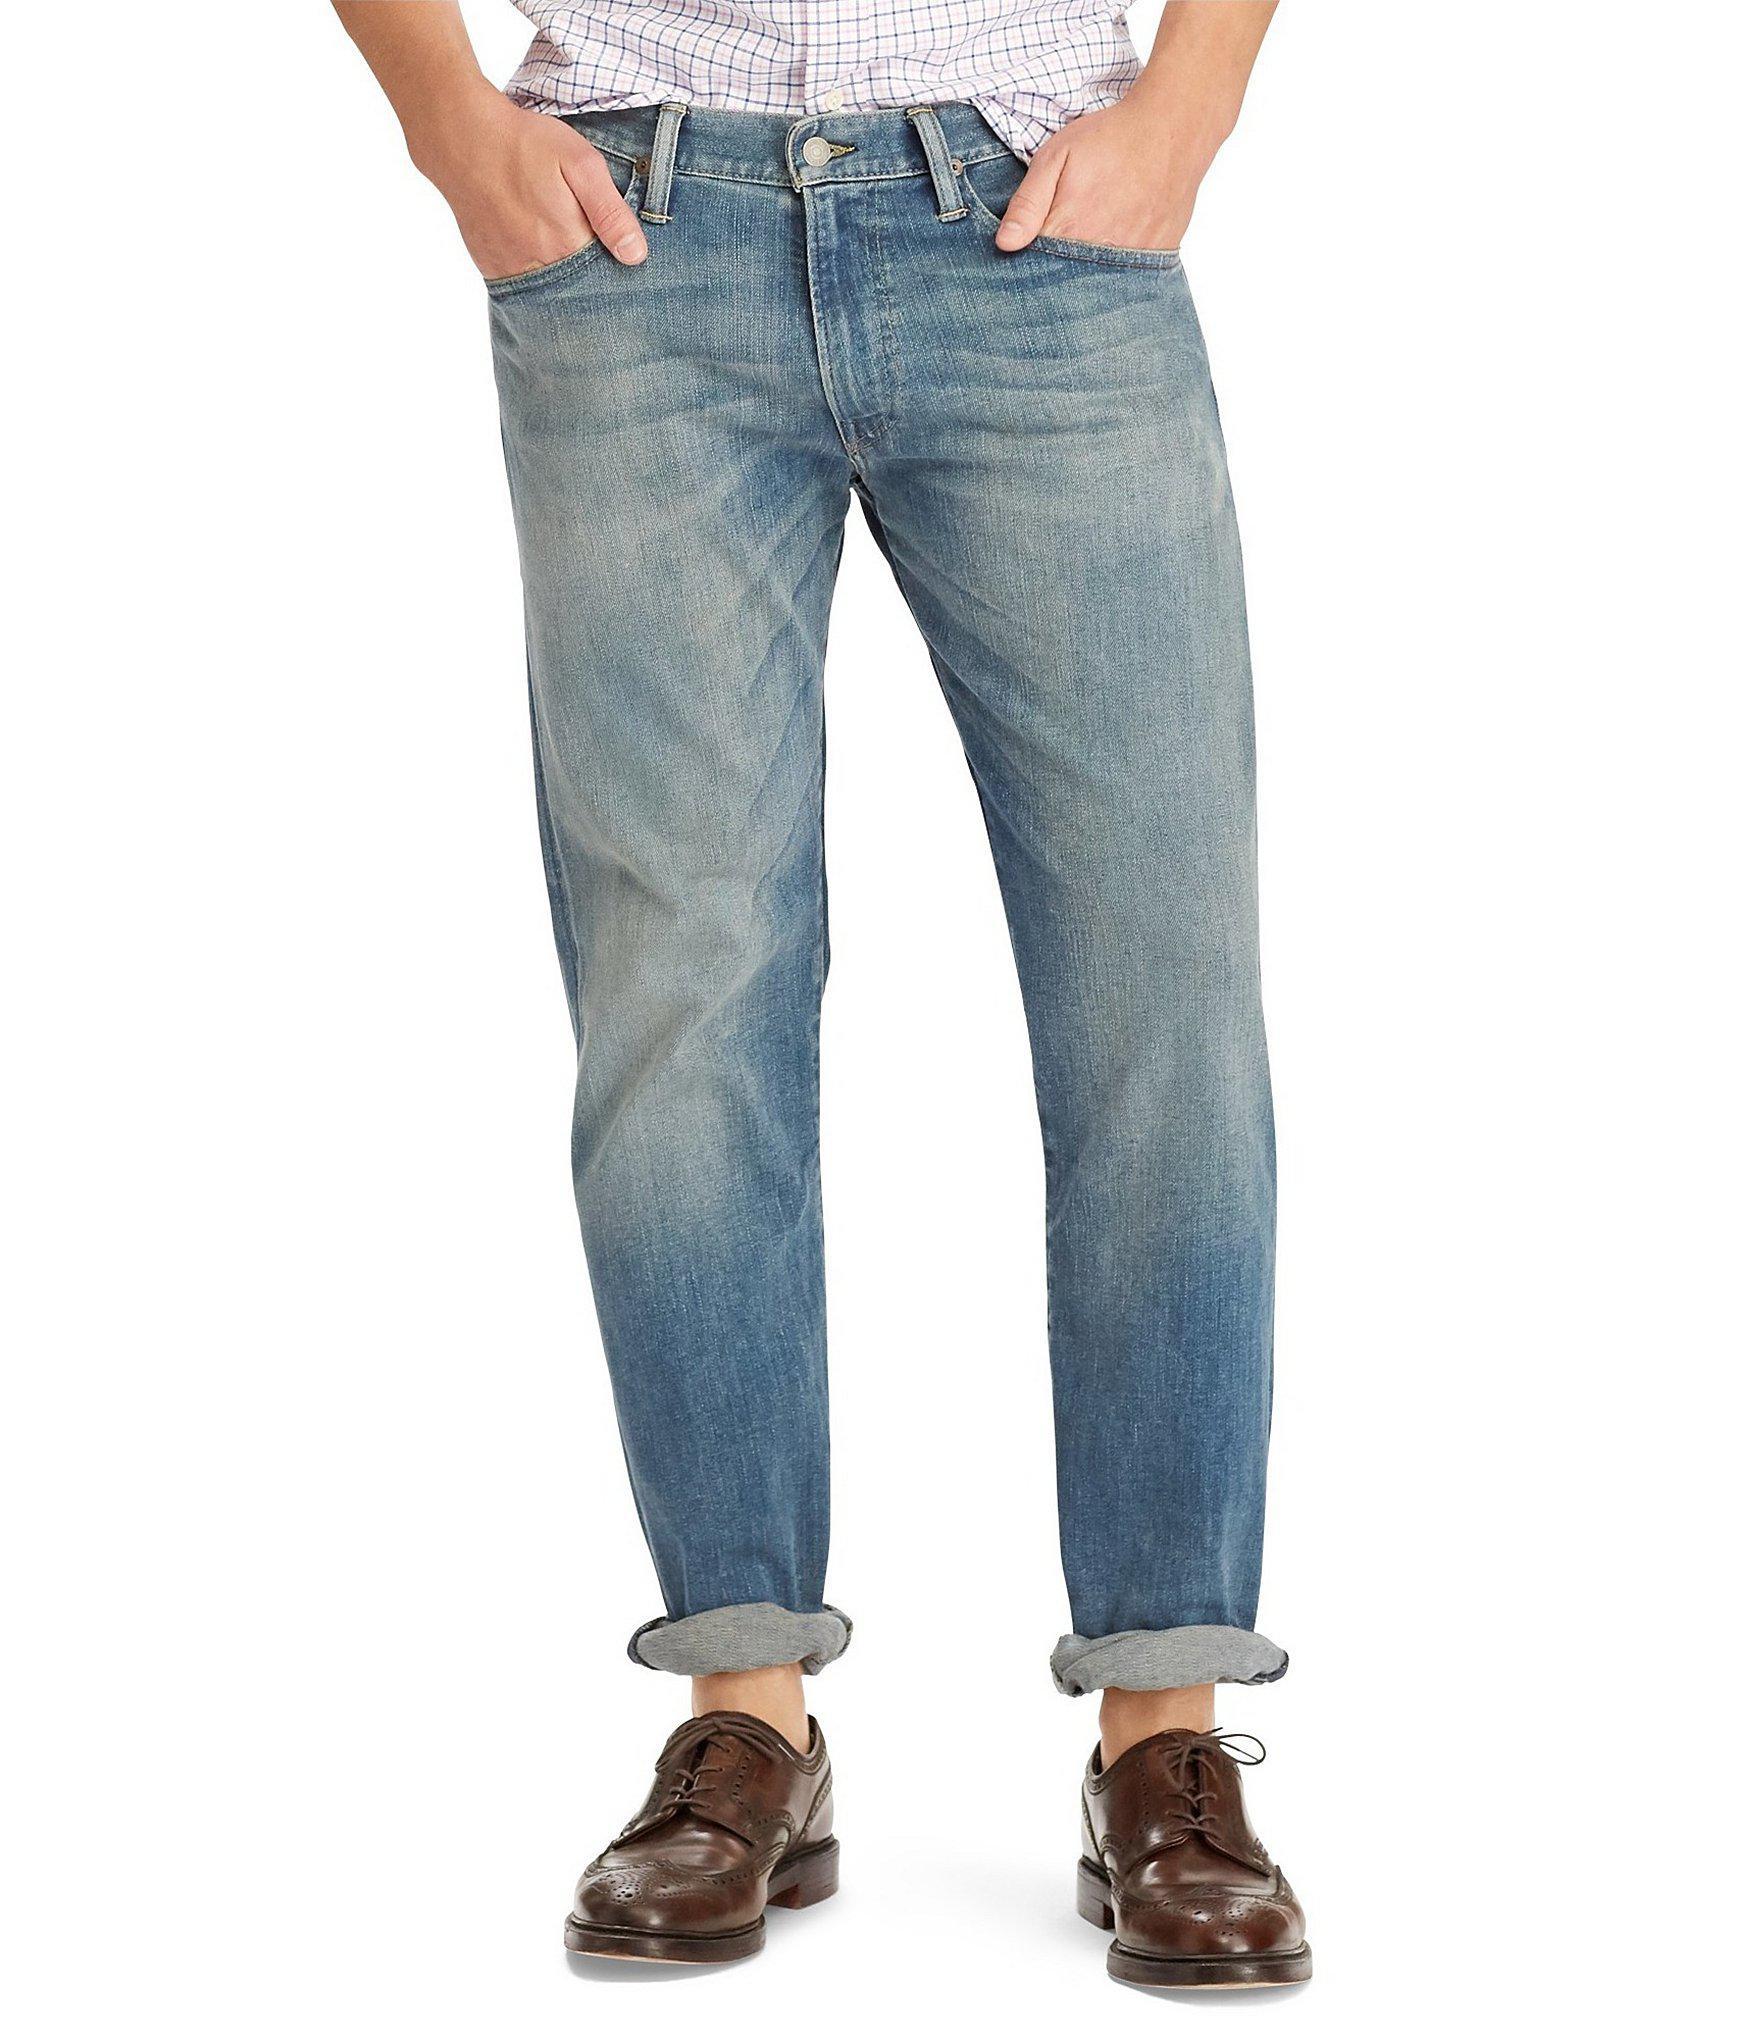 bcf37c193 Polo Ralph Lauren. Men s Blue Hampton Relaxed Straight-fit Stretch Denim  Jeans